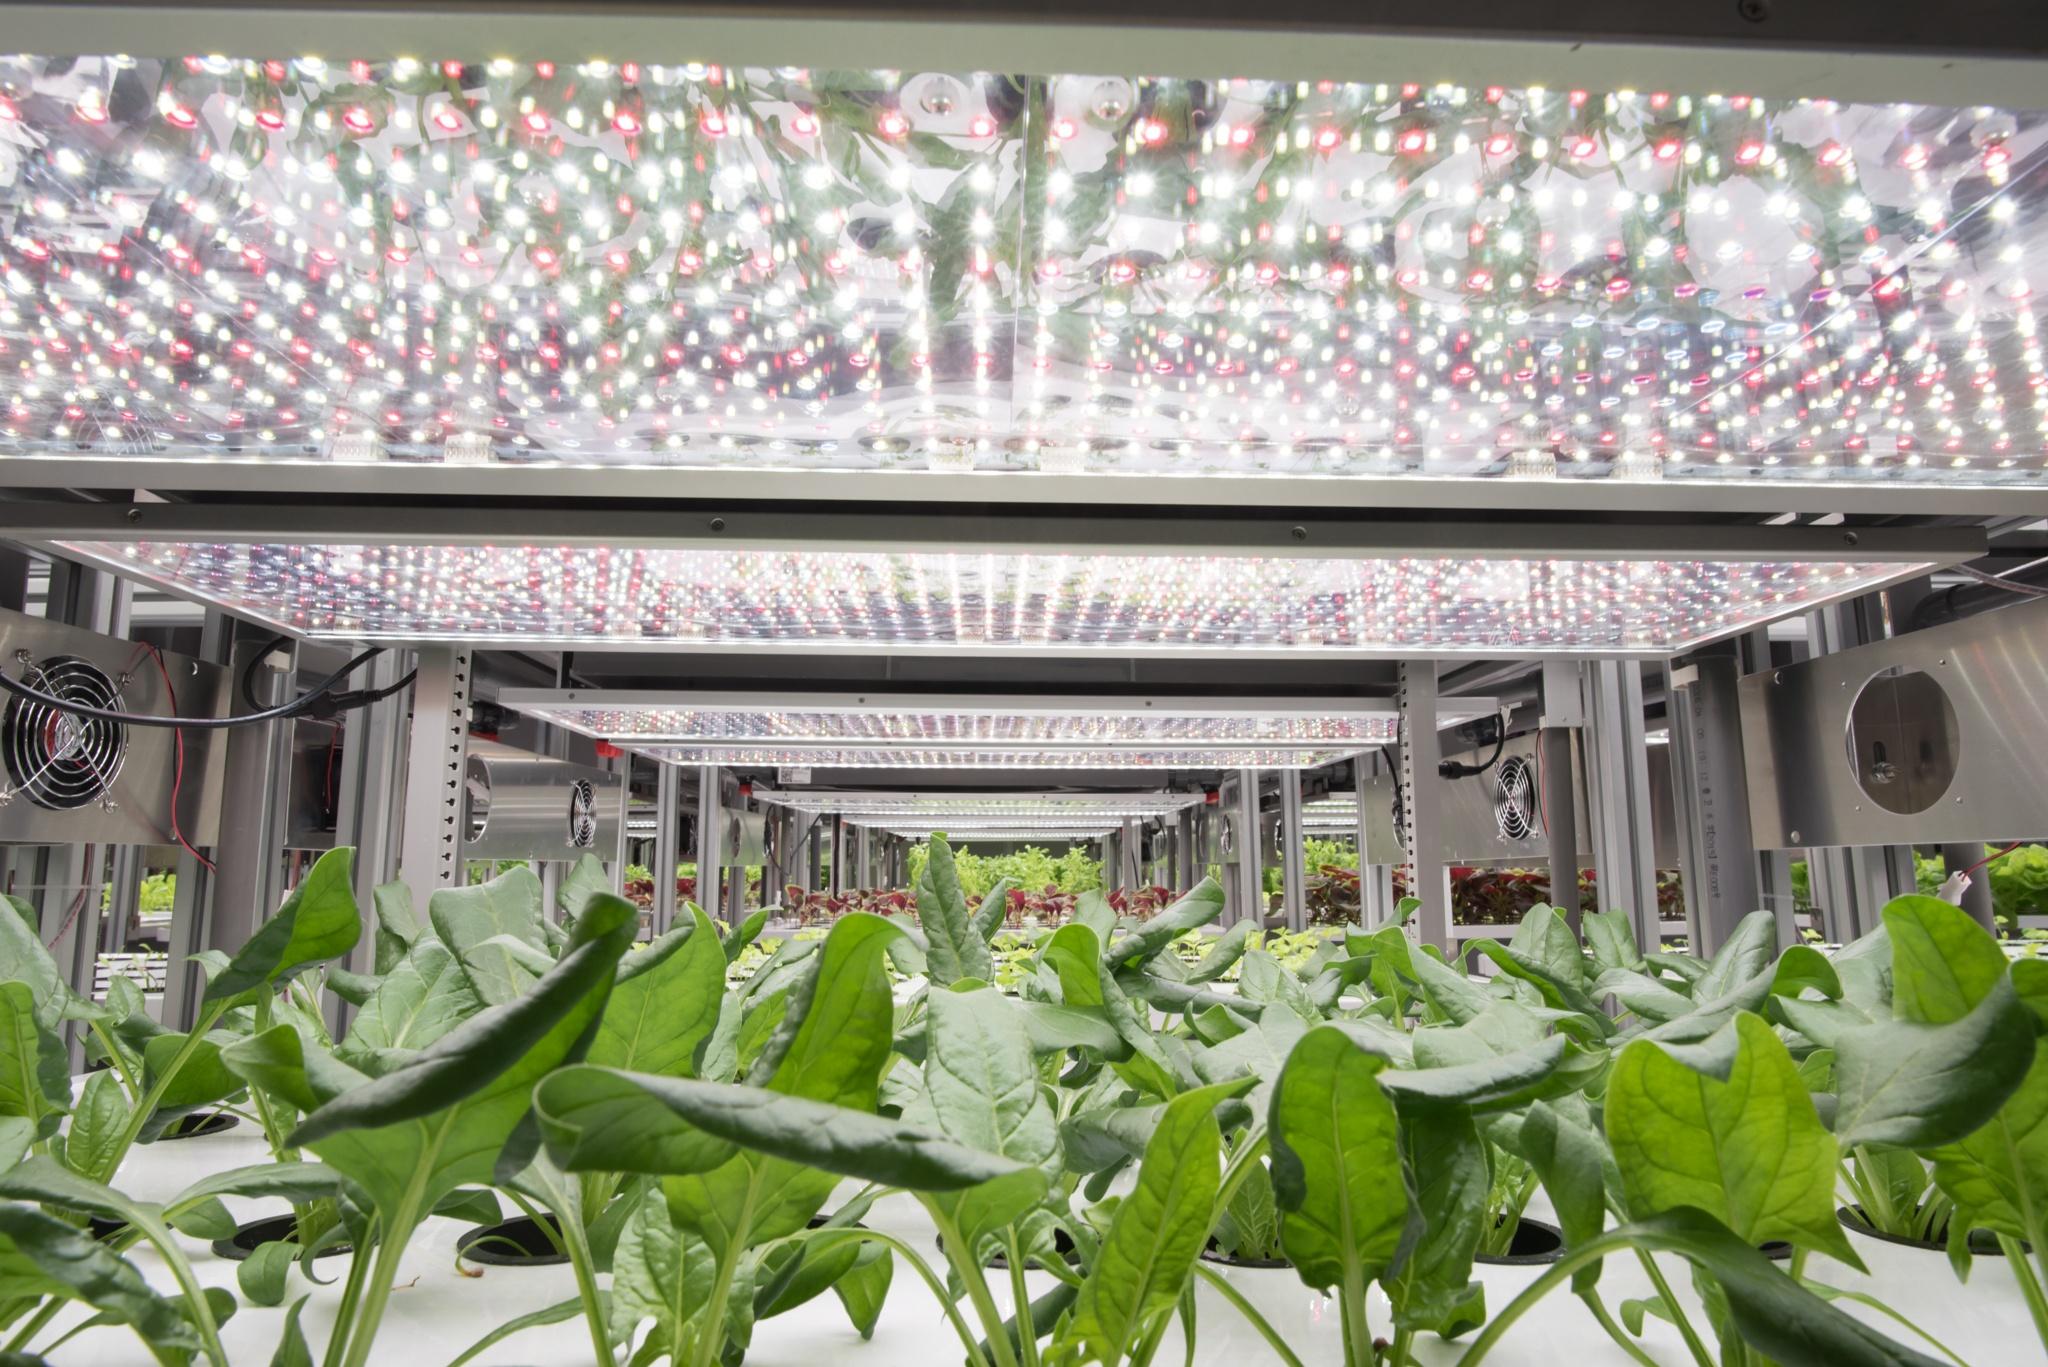 AessenseGrows Fresh AEtrium-2 Vegetable Growth